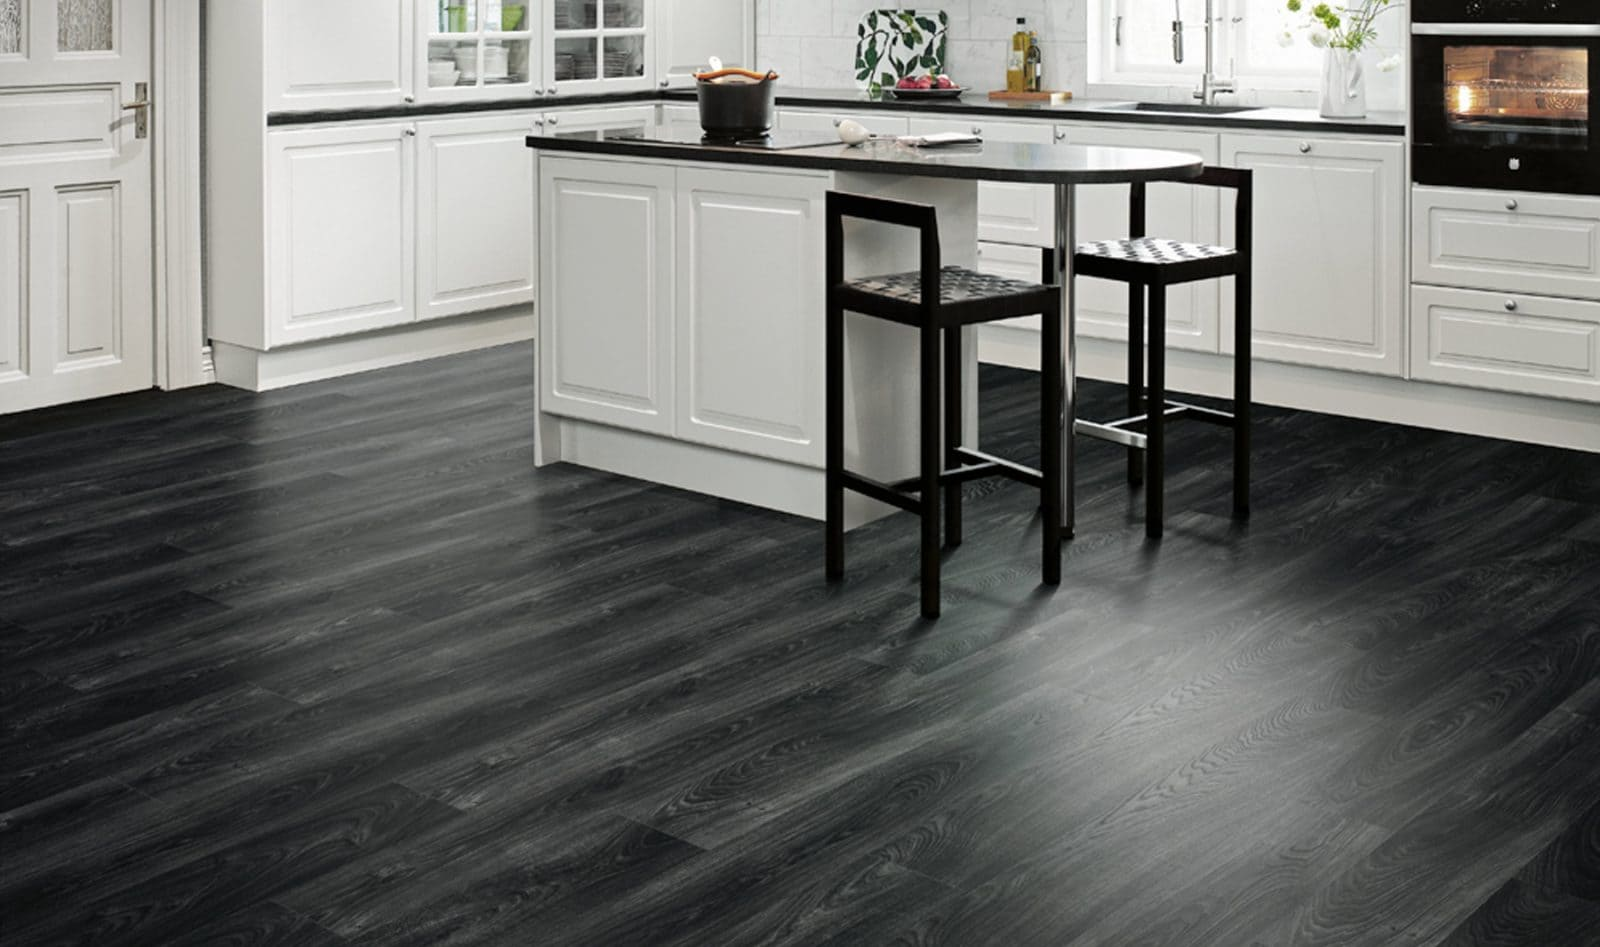 темный ламинат на полу в кухне